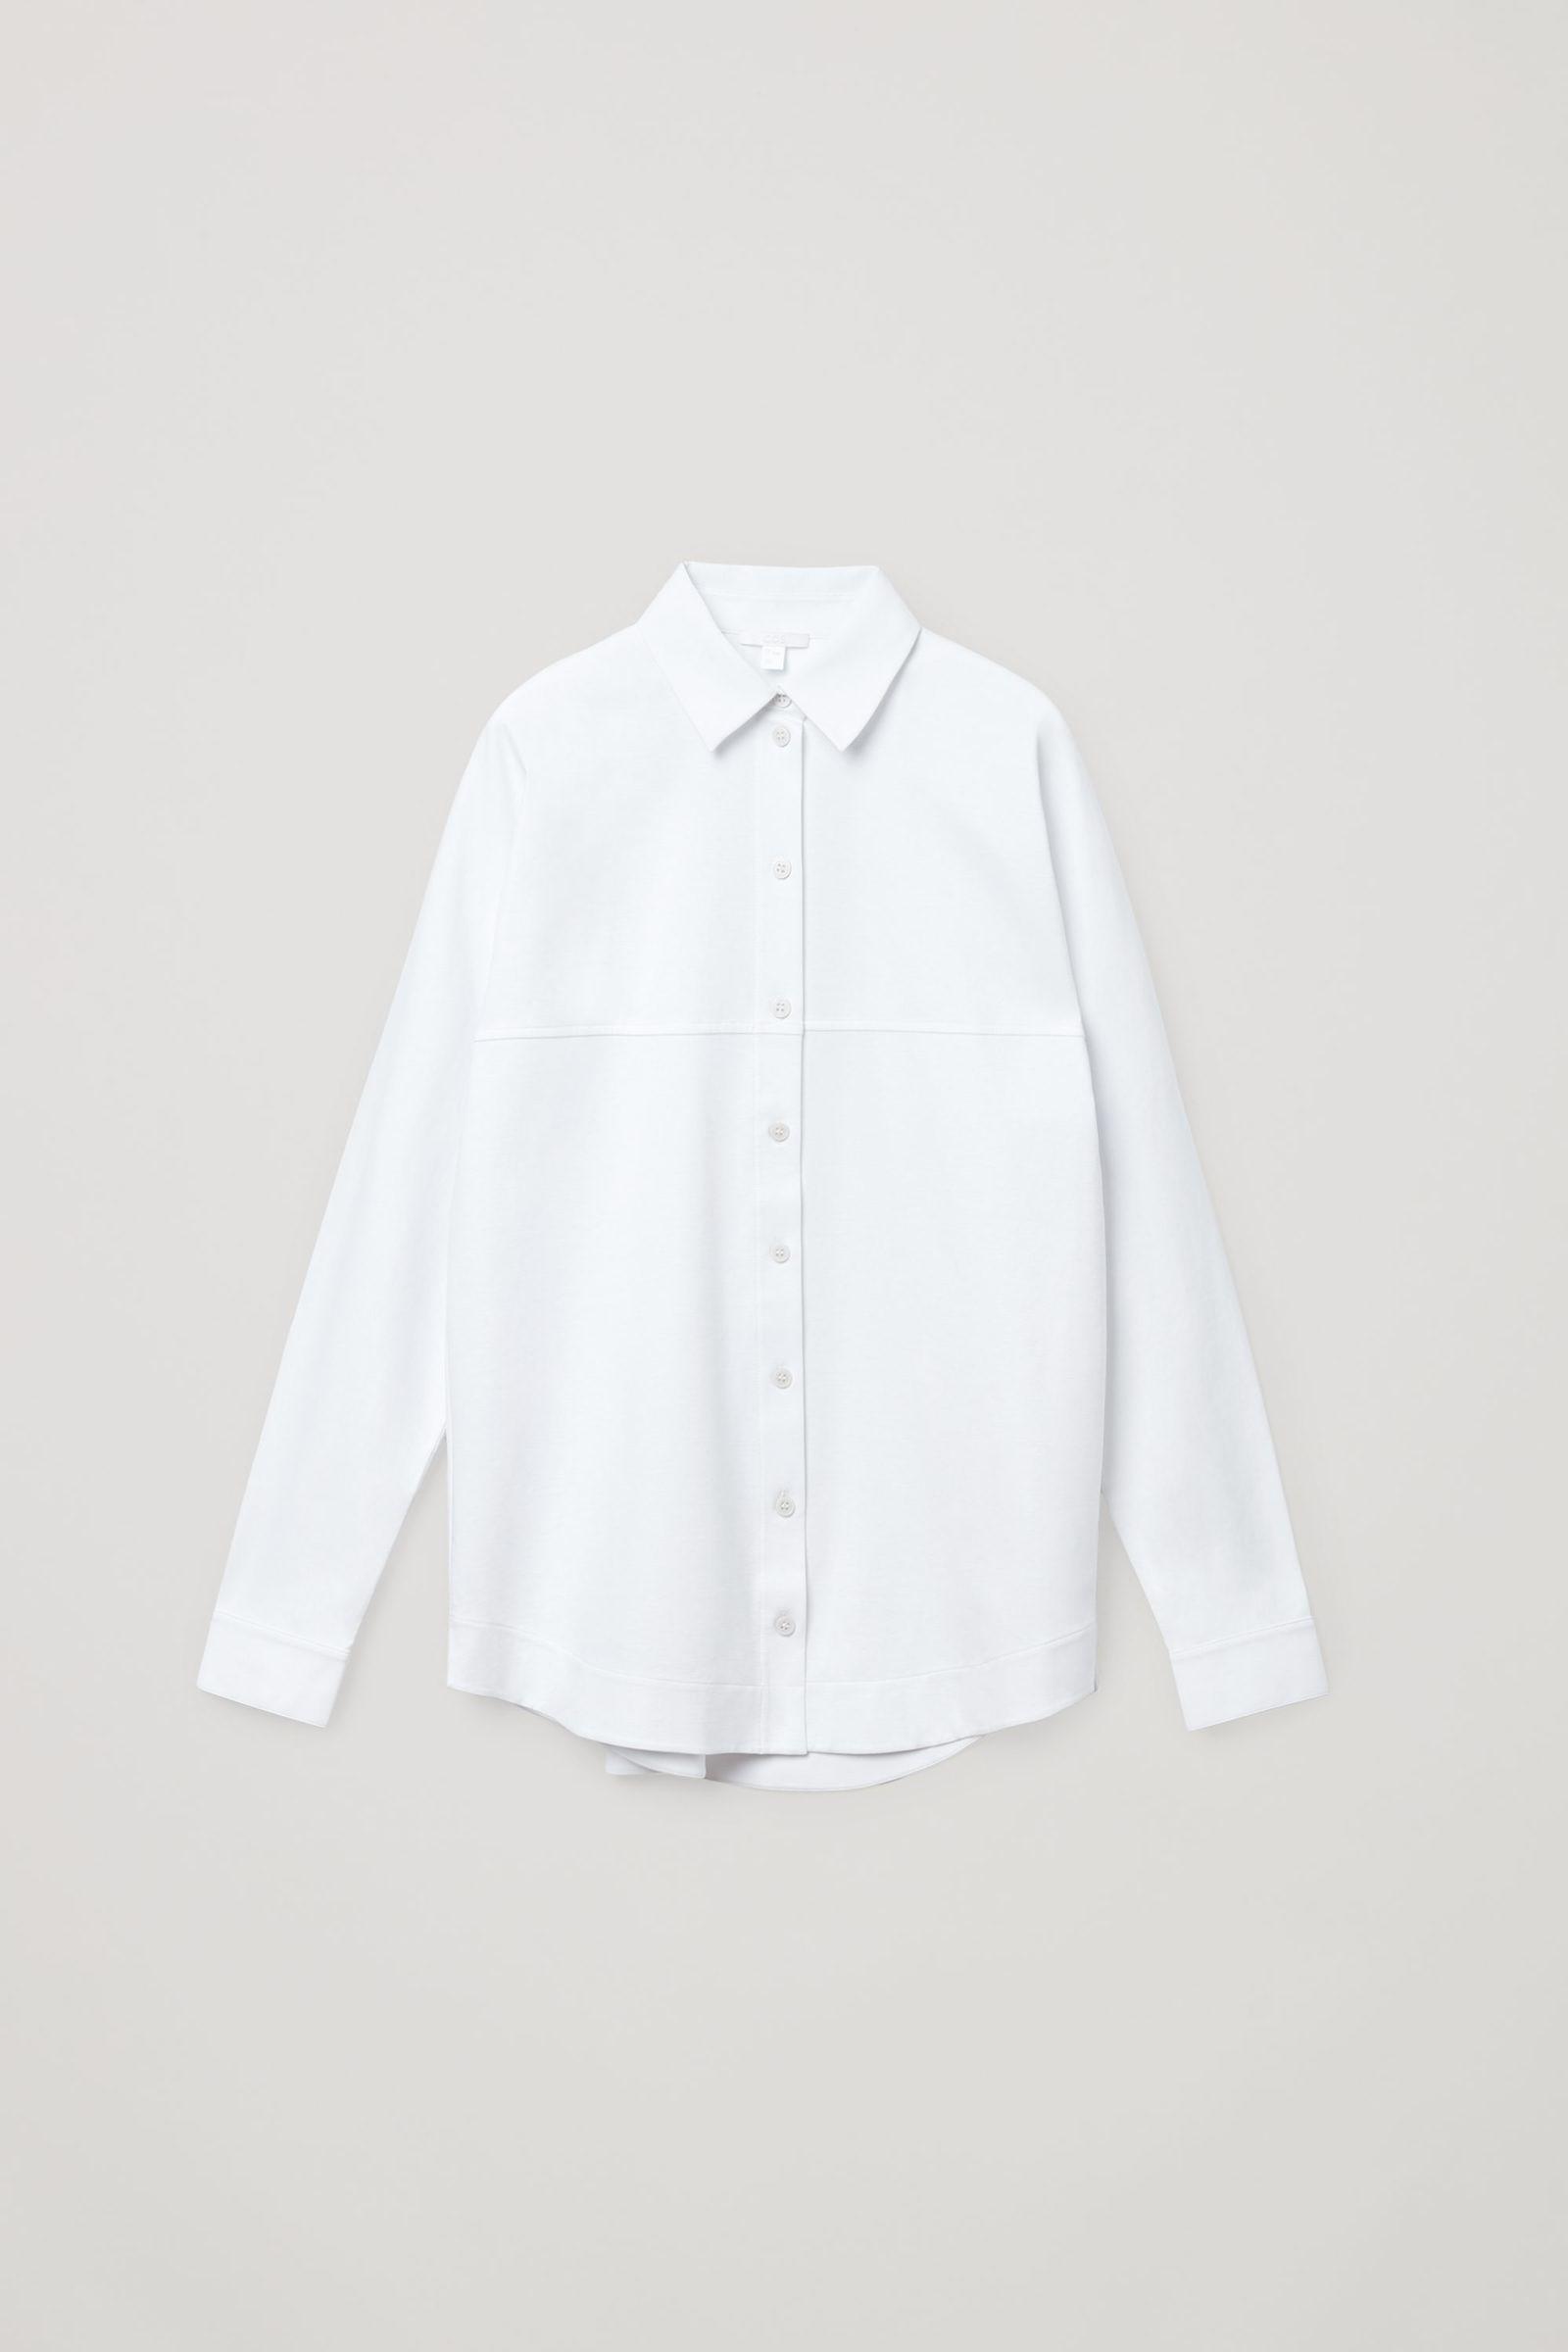 COS 플리츠 코튼 셔츠의 화이트컬러 Product입니다.